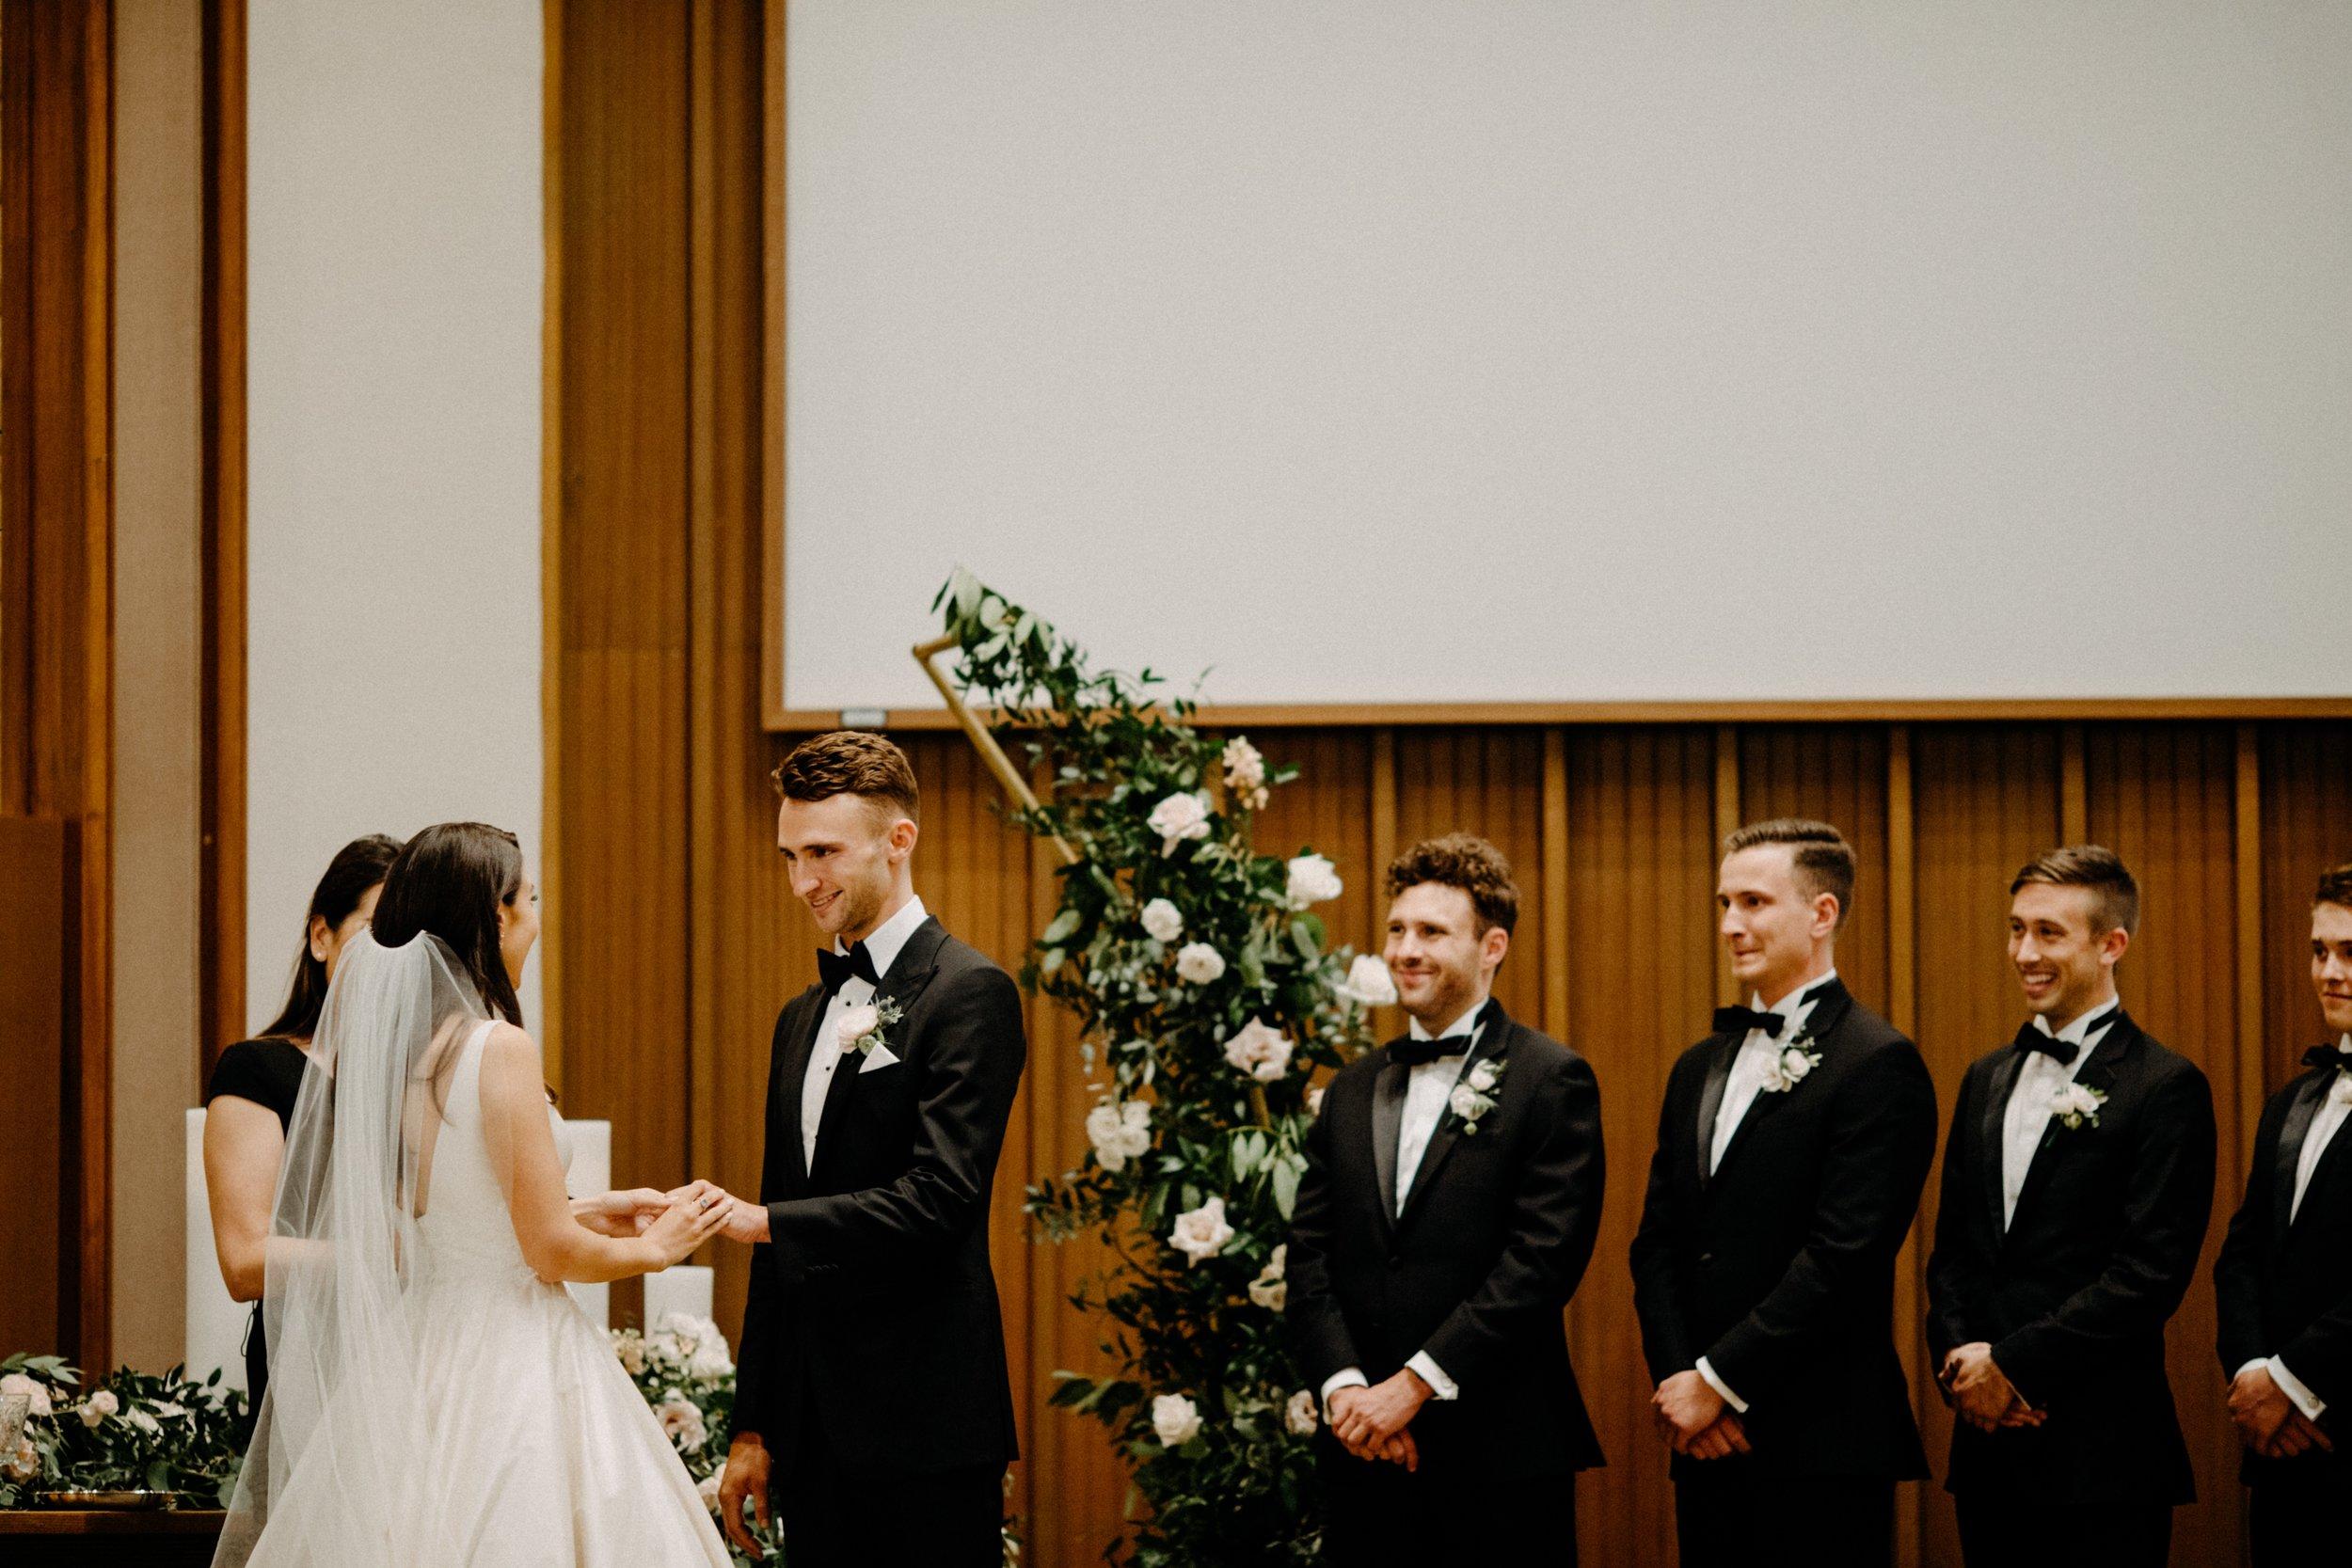 st-anthony-hotel-wedding-photography-10077san-antonio.JPG